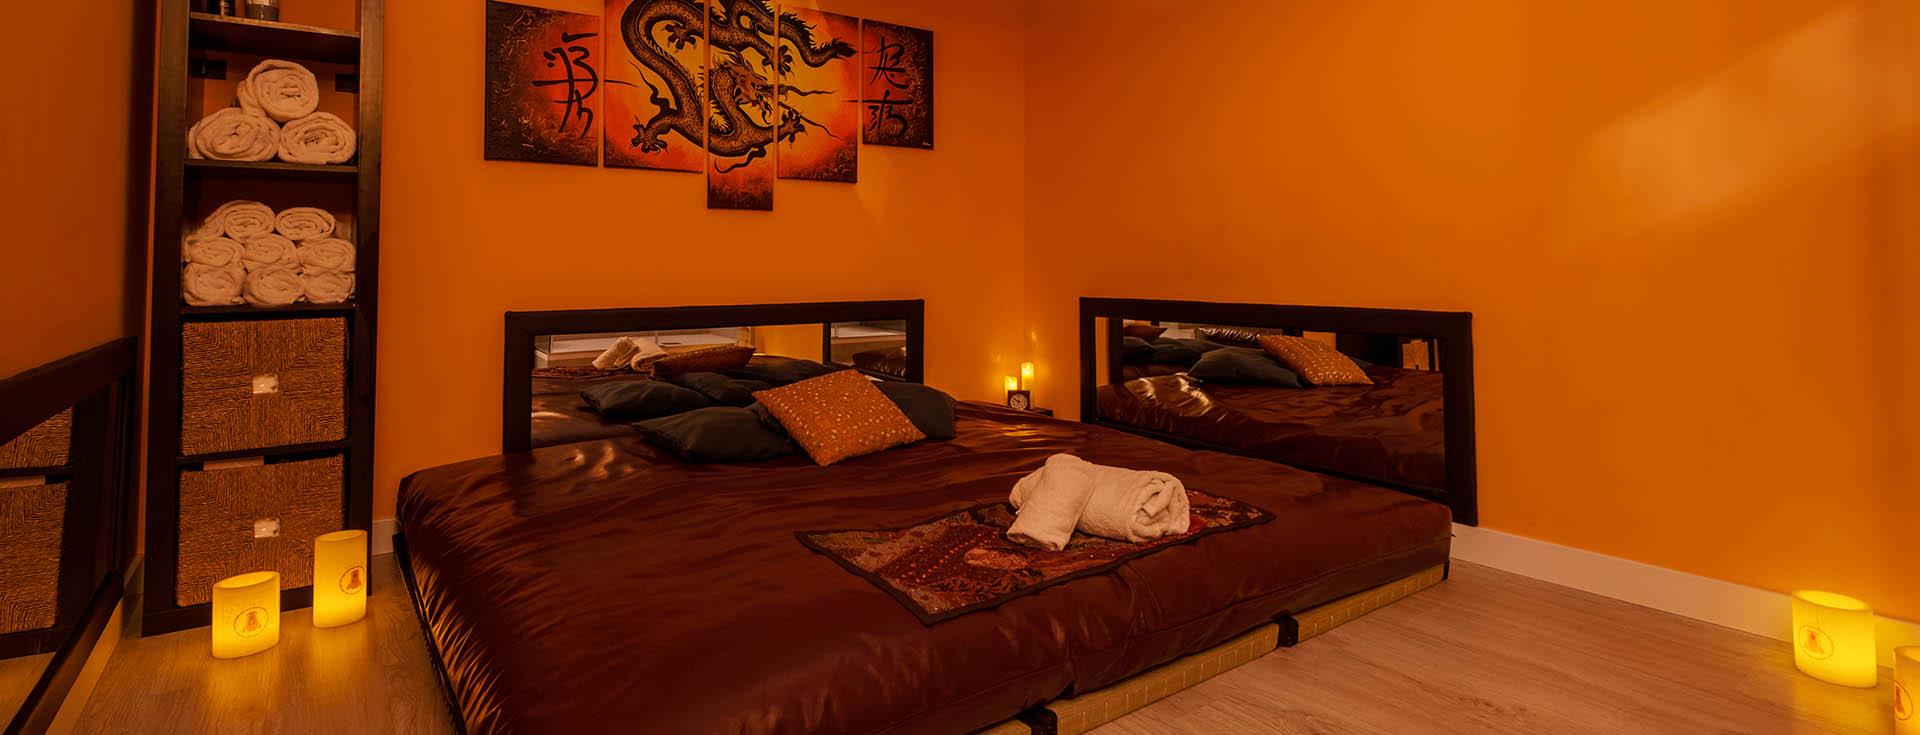 masajes shiva centro de masajes